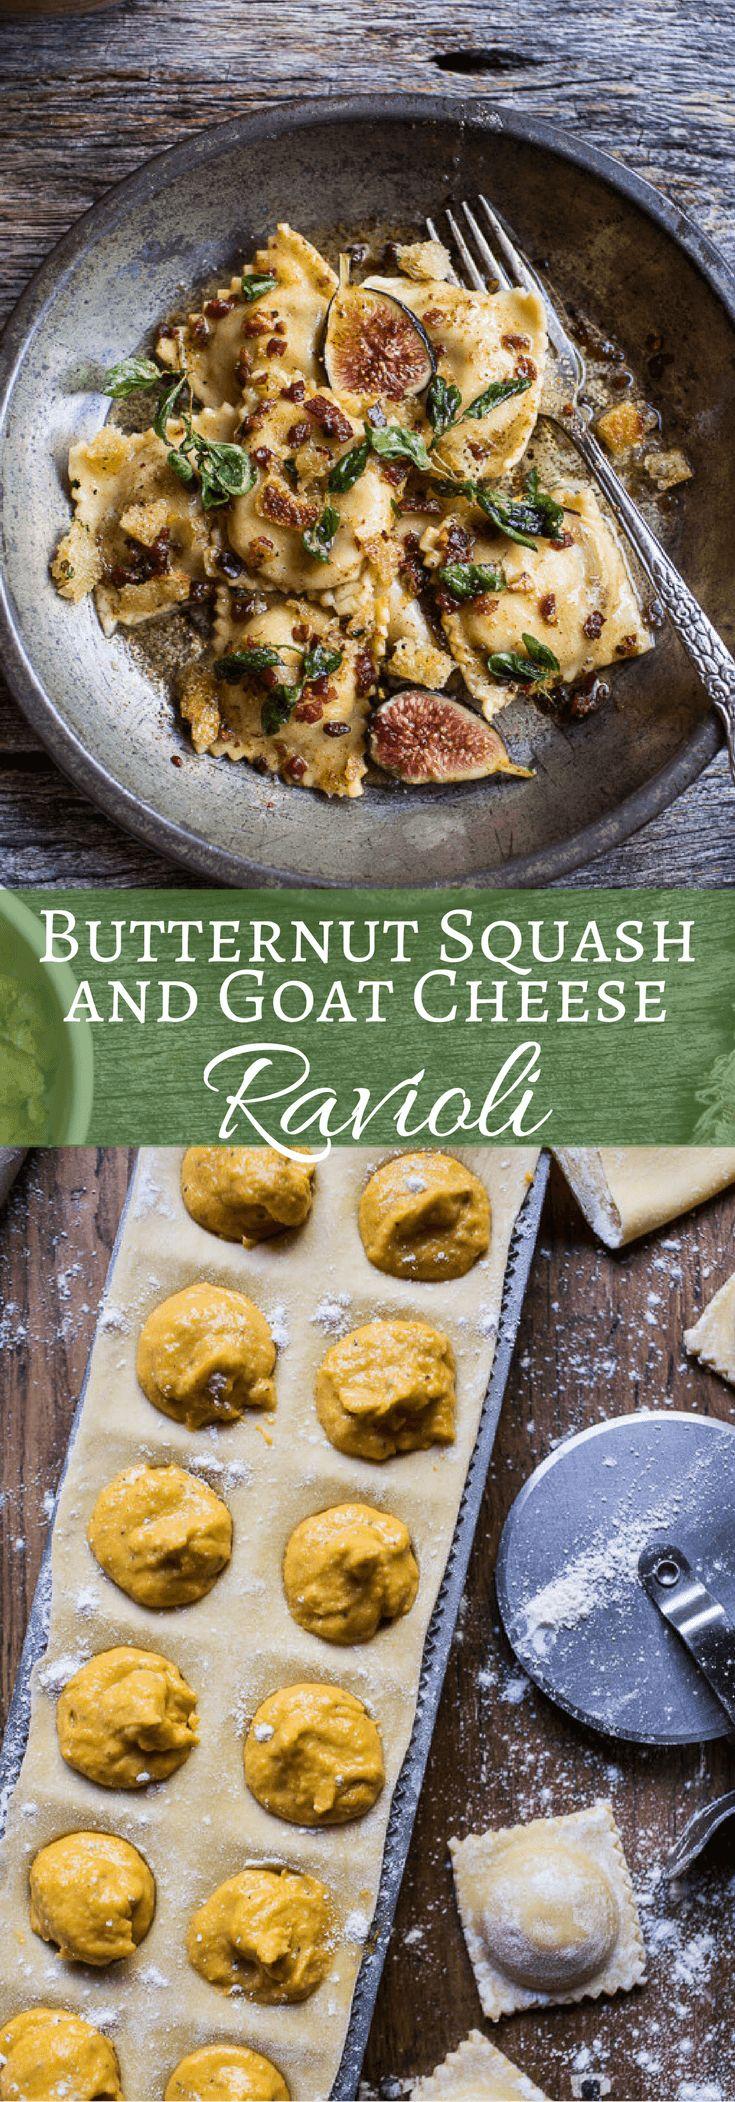 17 Best Ideas About Ravioli Recipe On Pinterest Baked